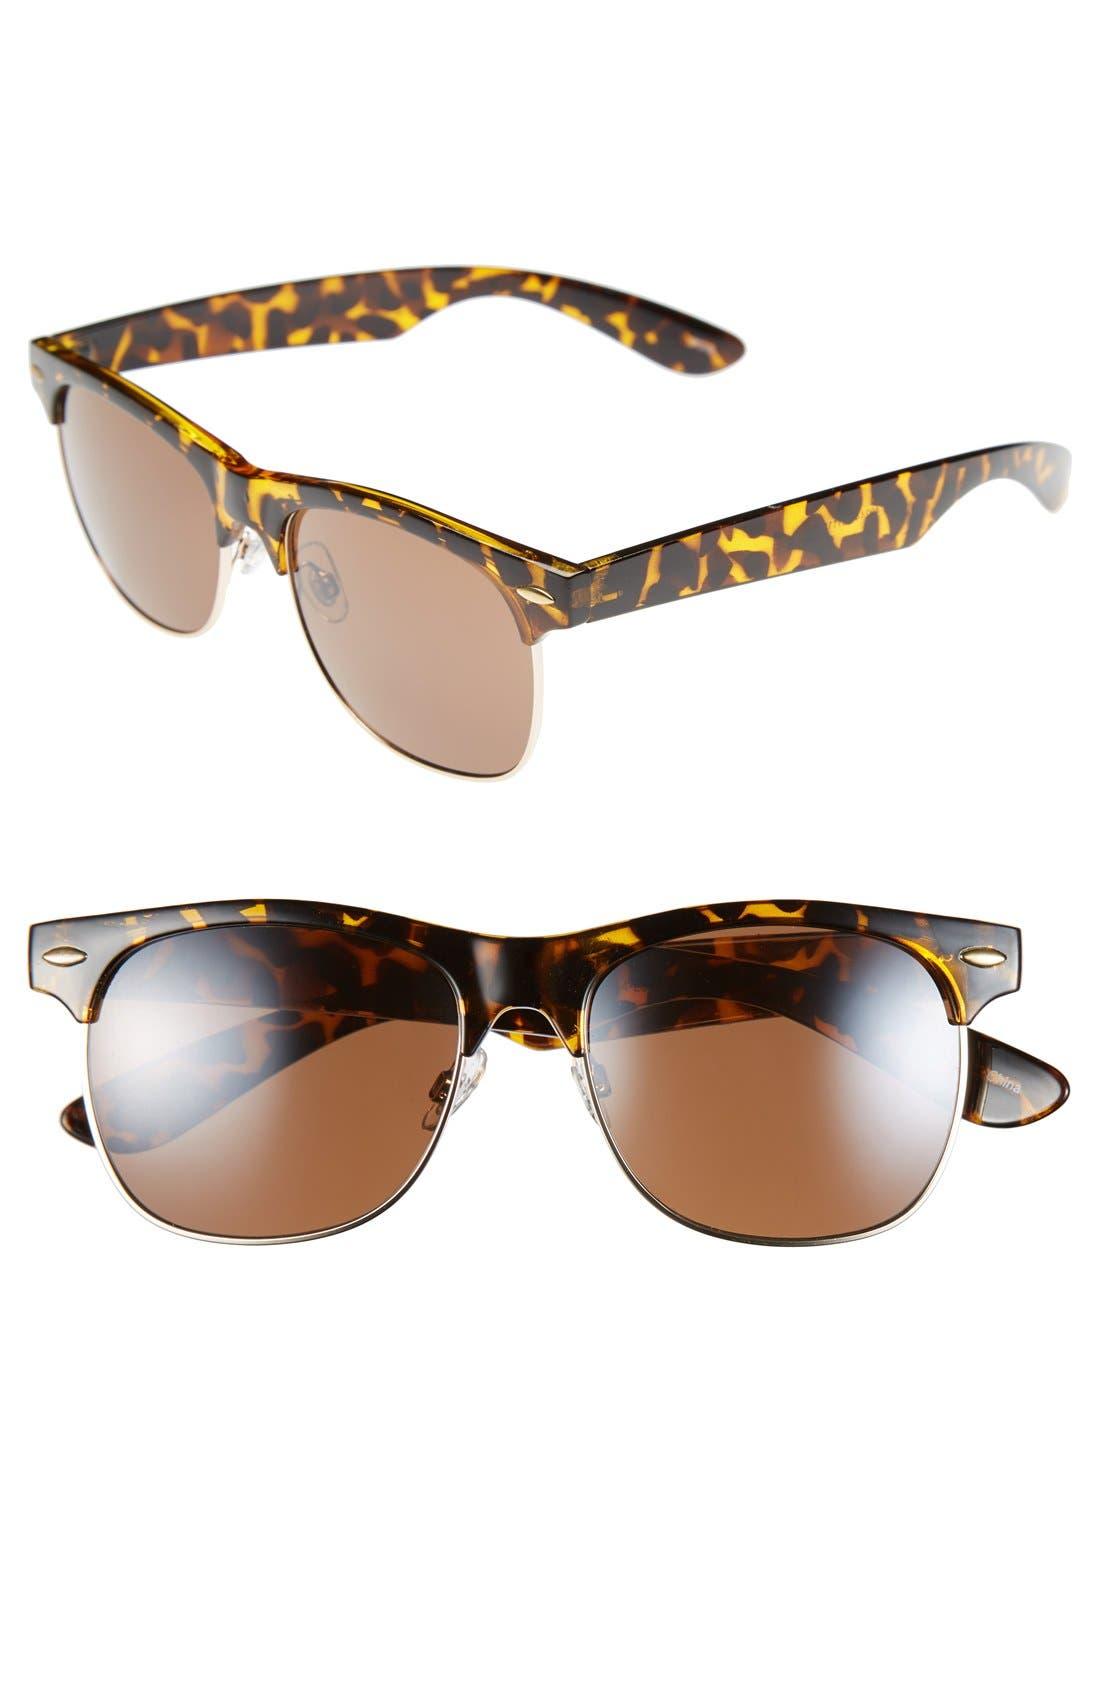 Main Image - Icon Eyewear 'Gloria' 53mm Retro Half Wire Frame Sunglasses (Juniors) (2 for $20)